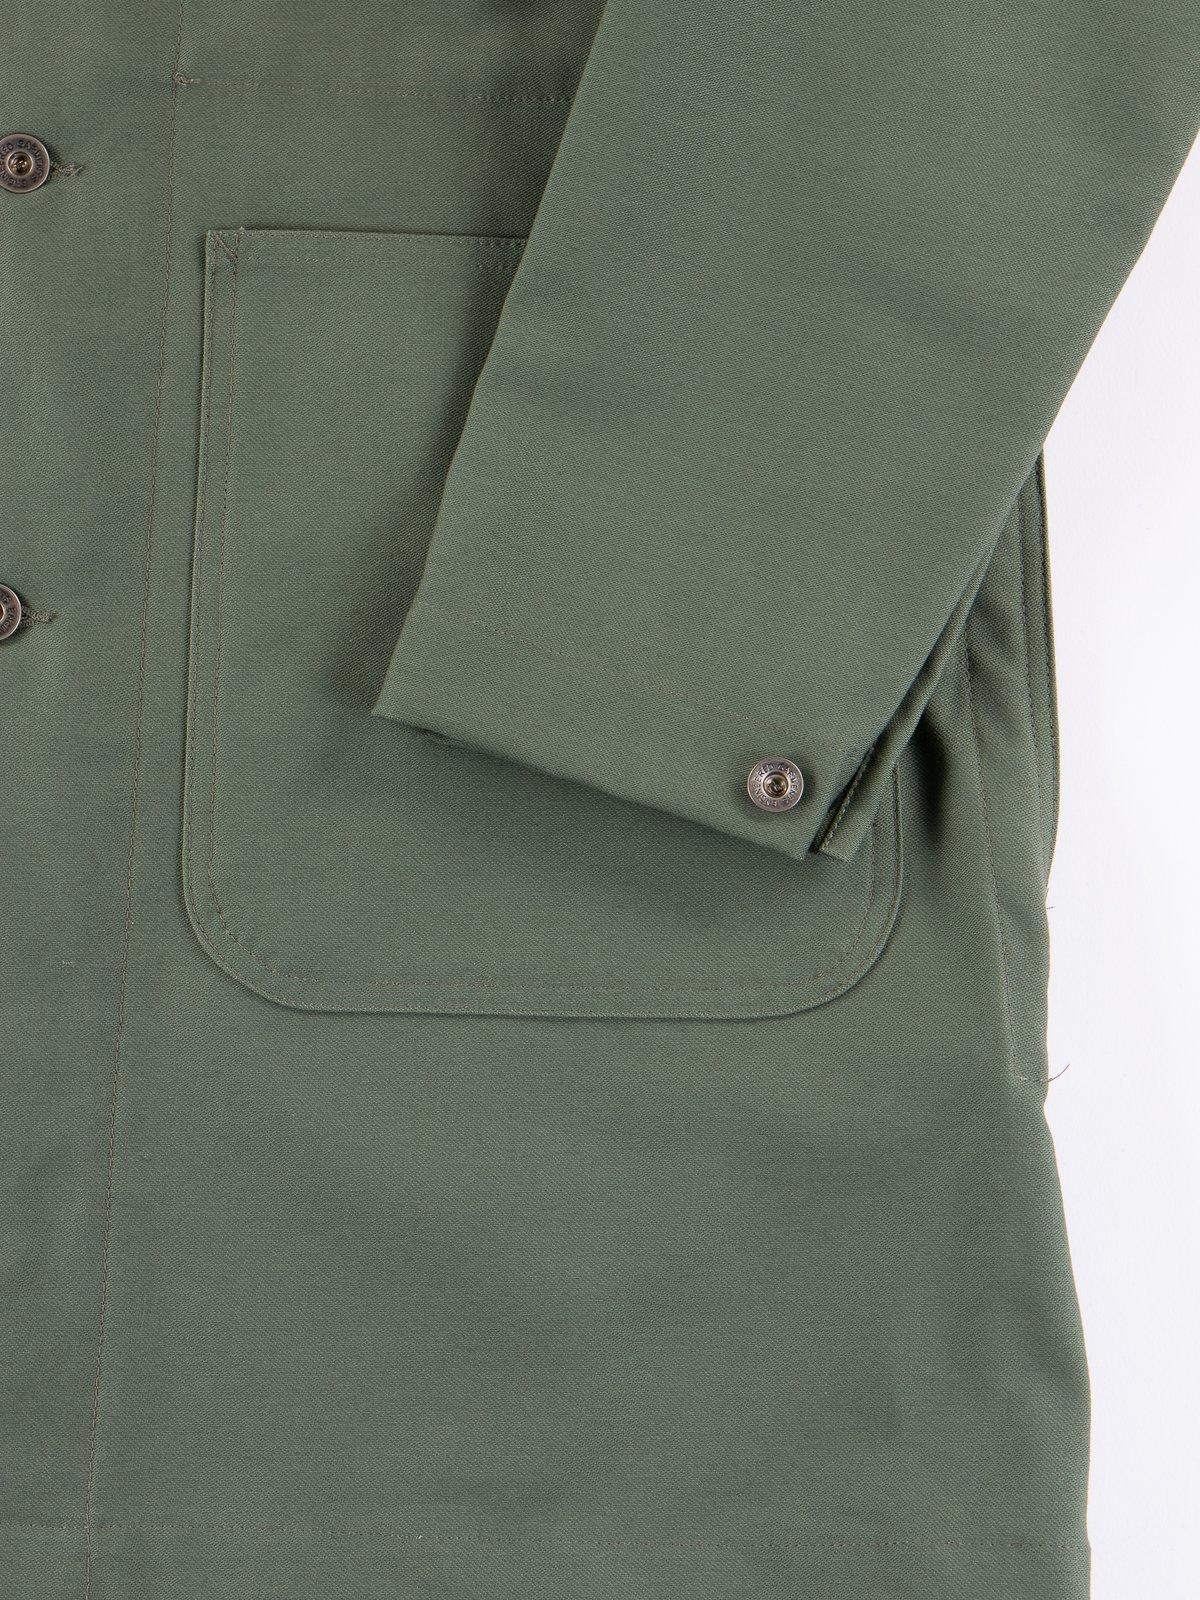 Olive Reversed Sateen Shop Coat - Image 3